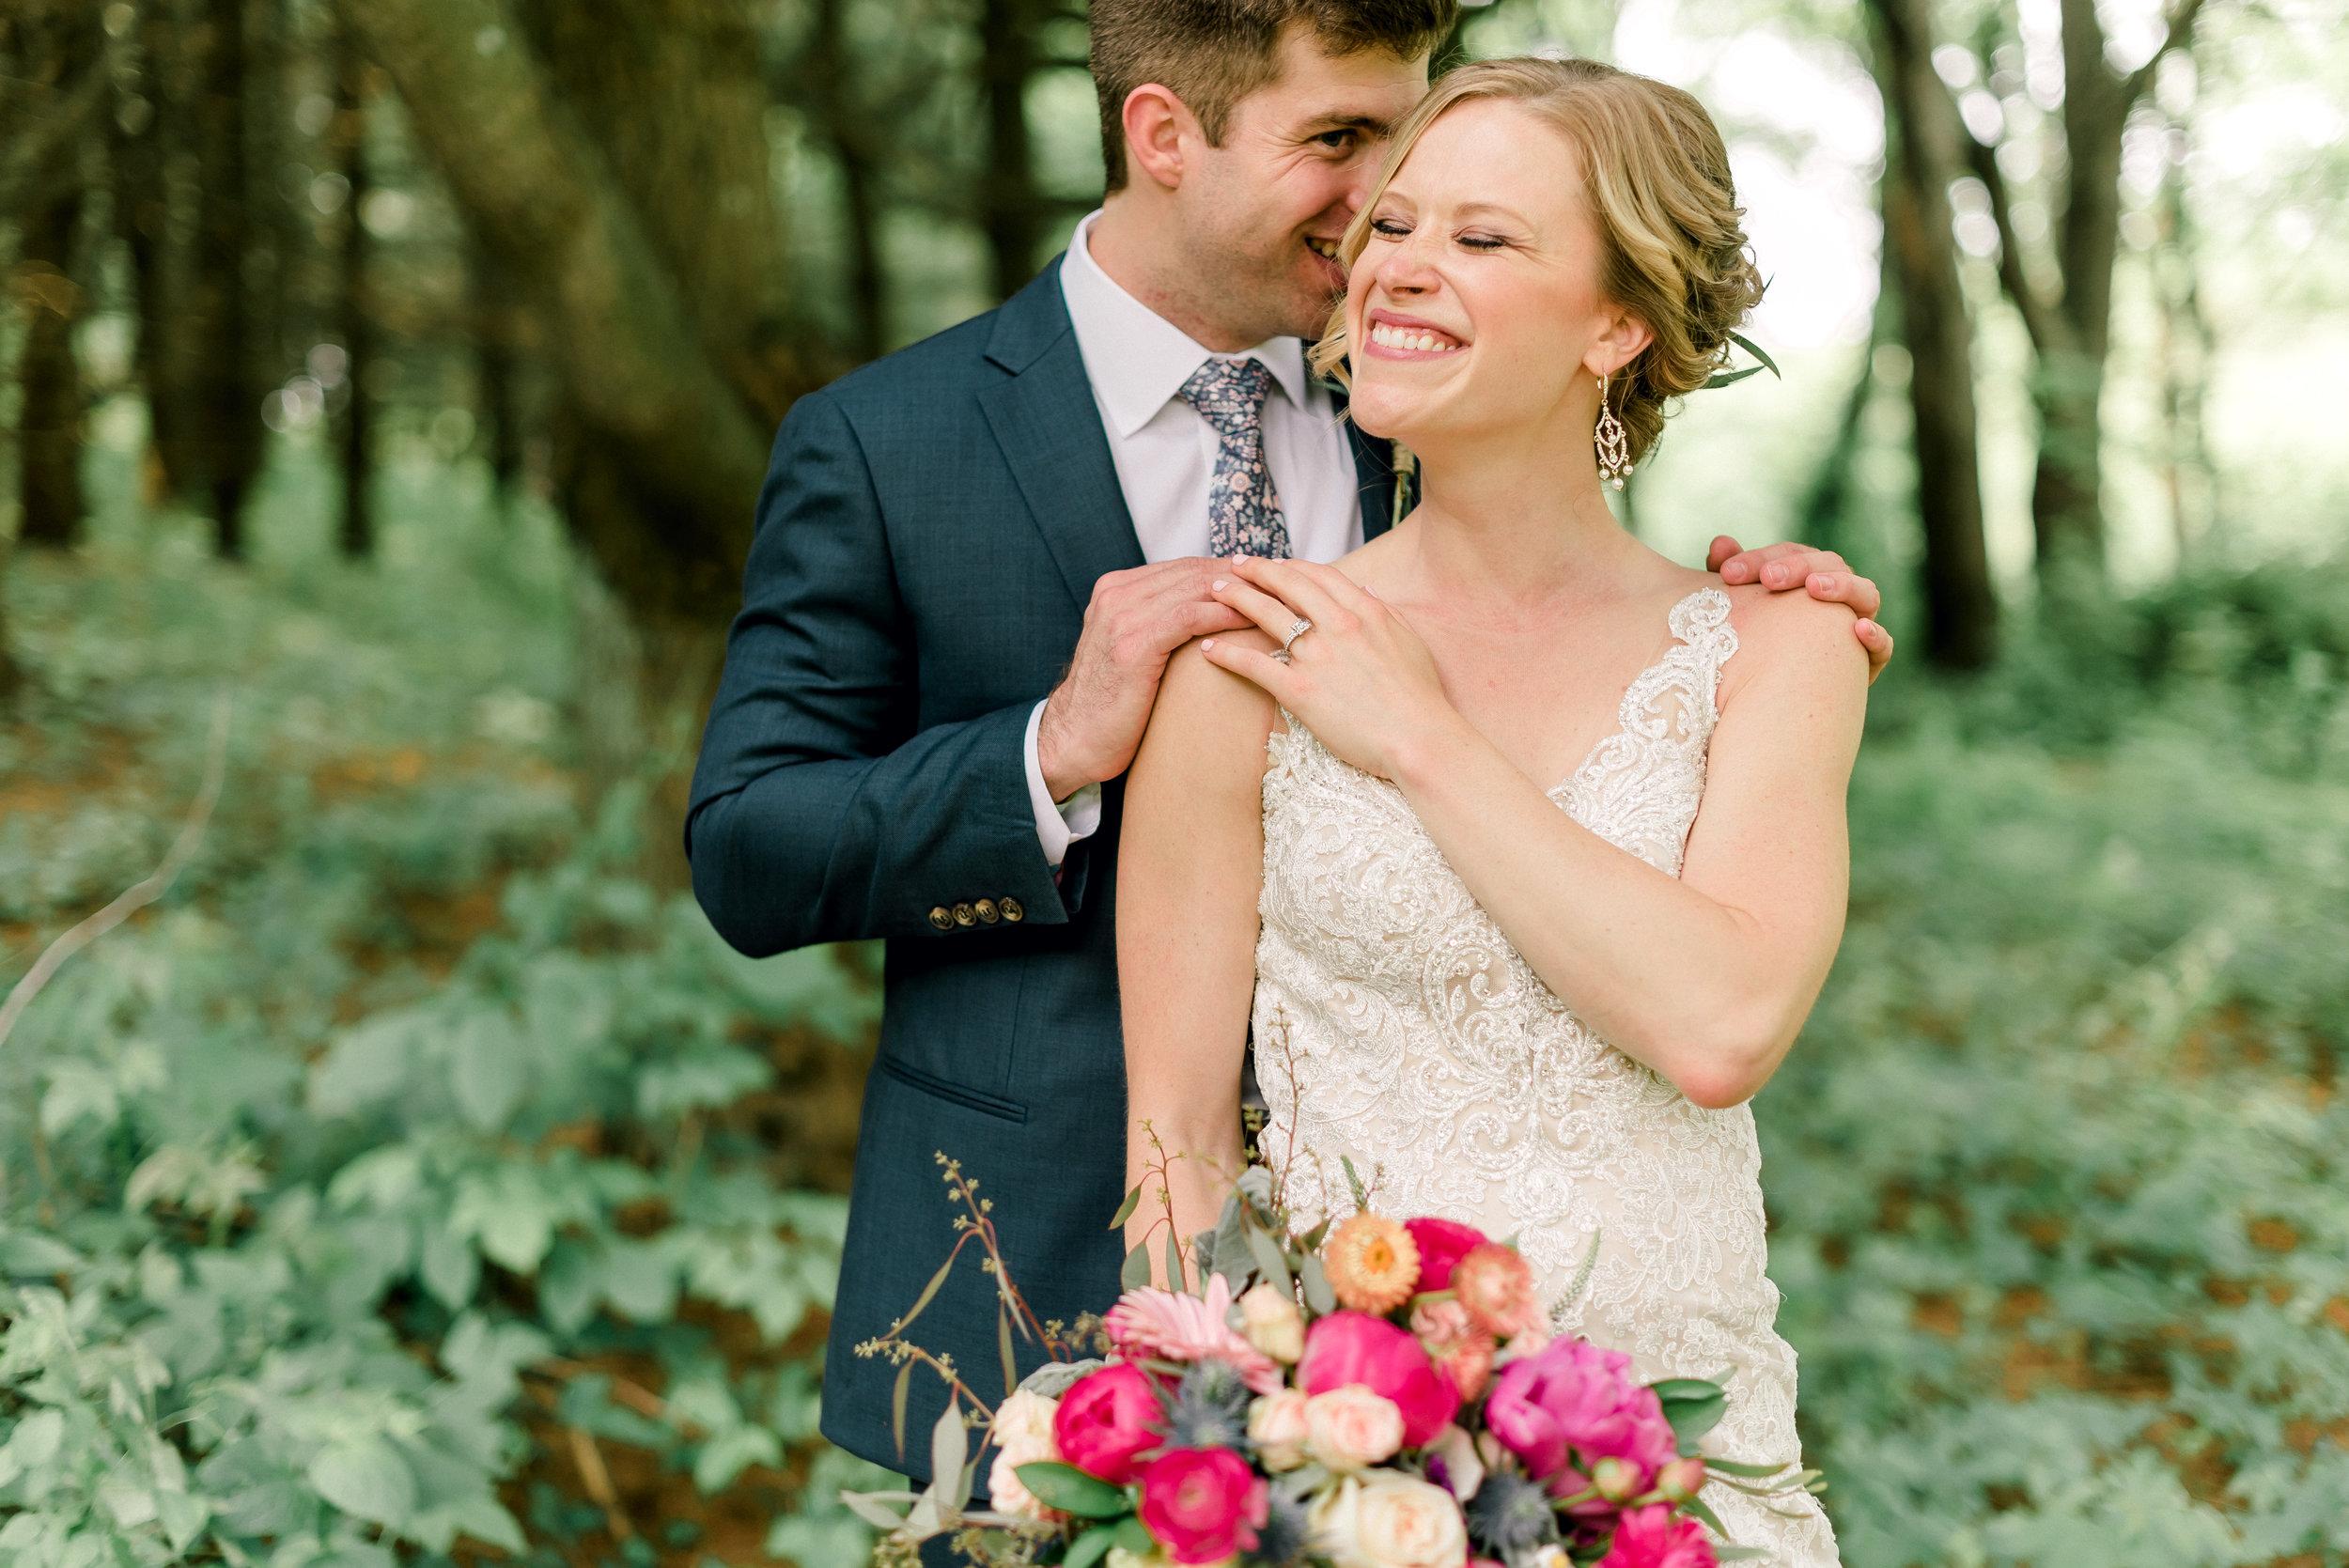 pittsburgh-wedding-photographer-shady-elms-farm-0028.jpg